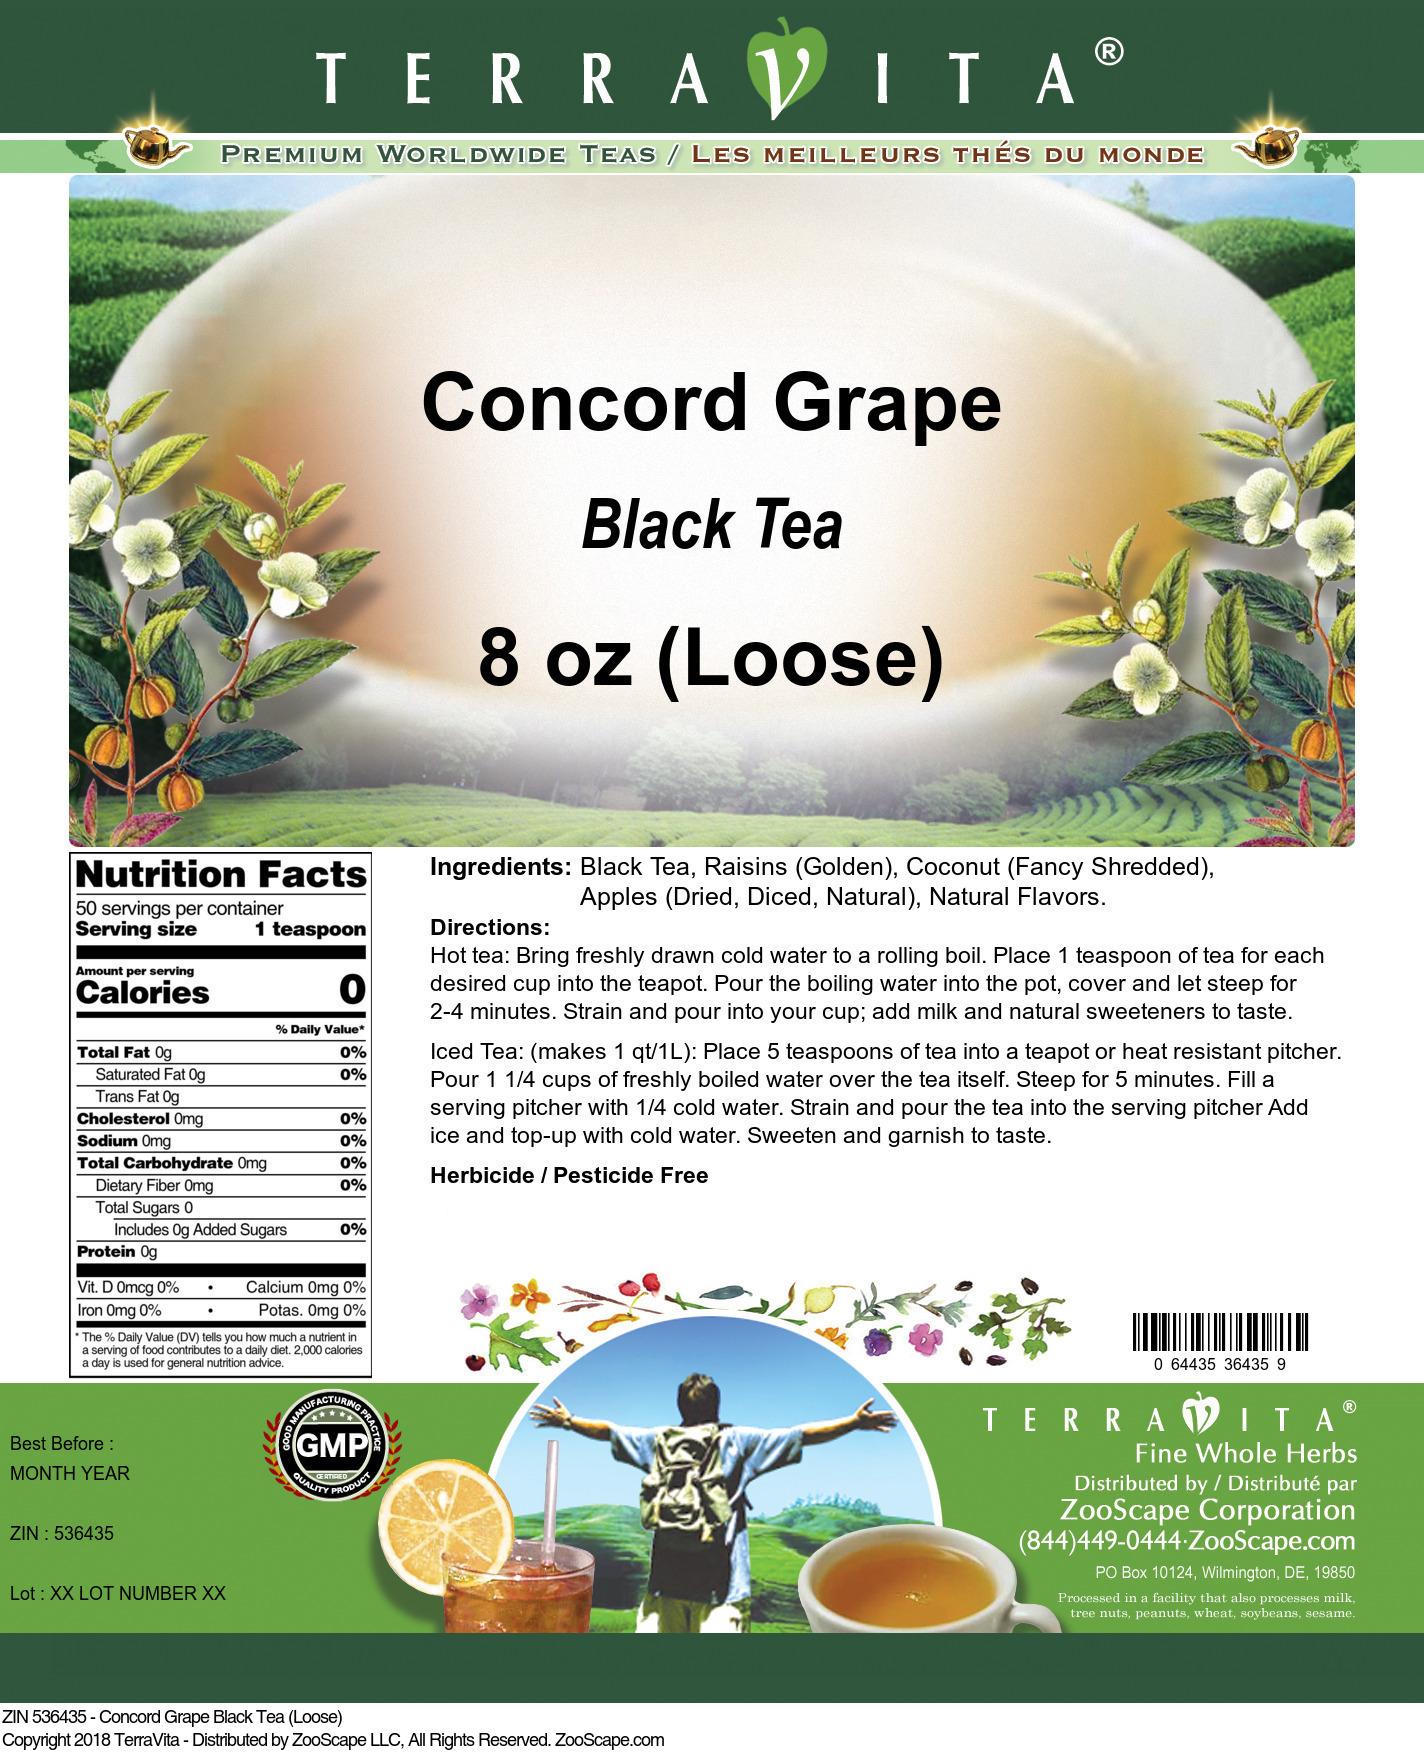 Concord Grape Black Tea (Loose)